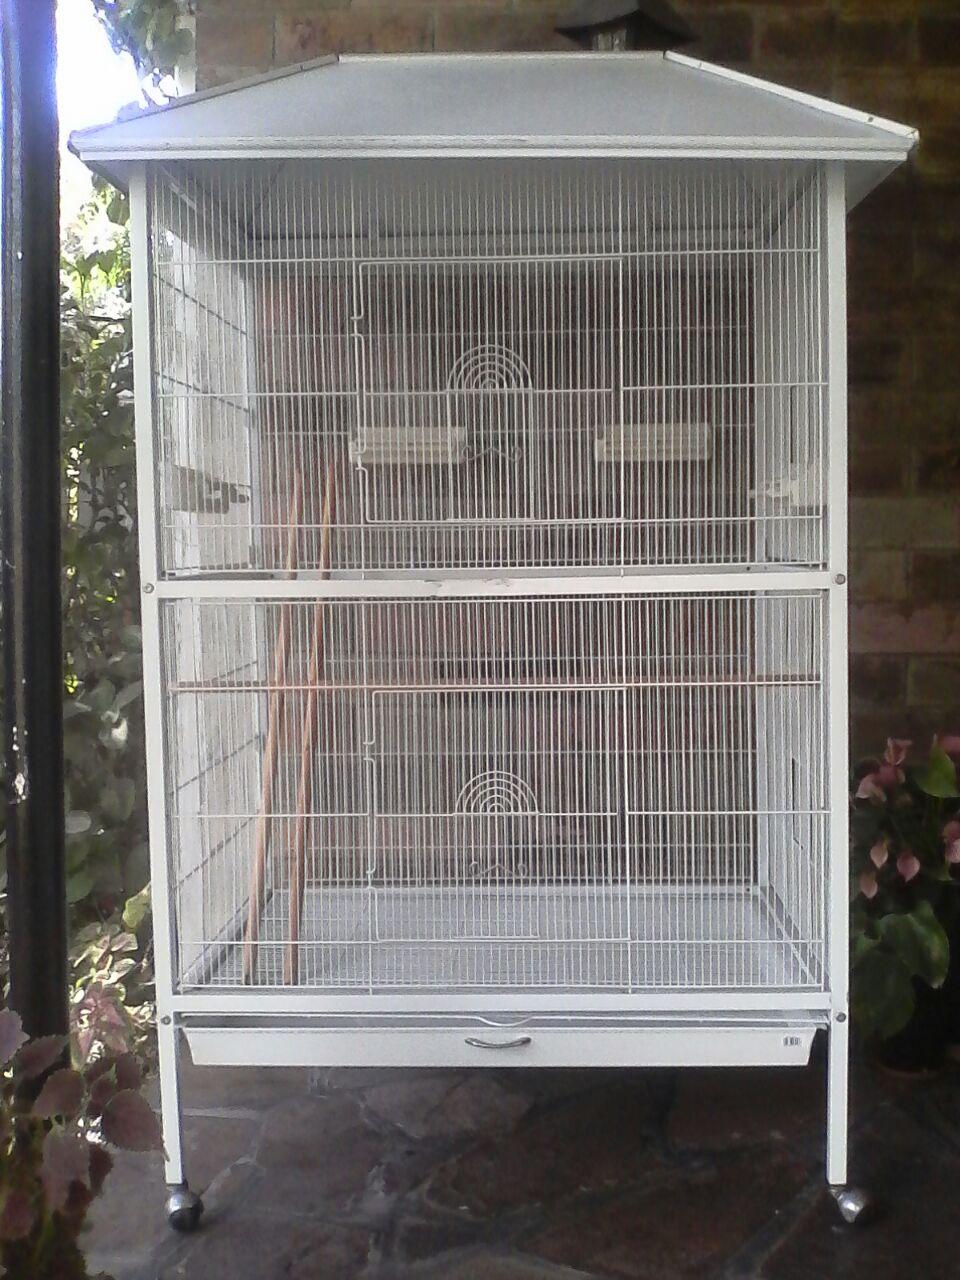 Mobile small - medium bird aviary | Junk Mail